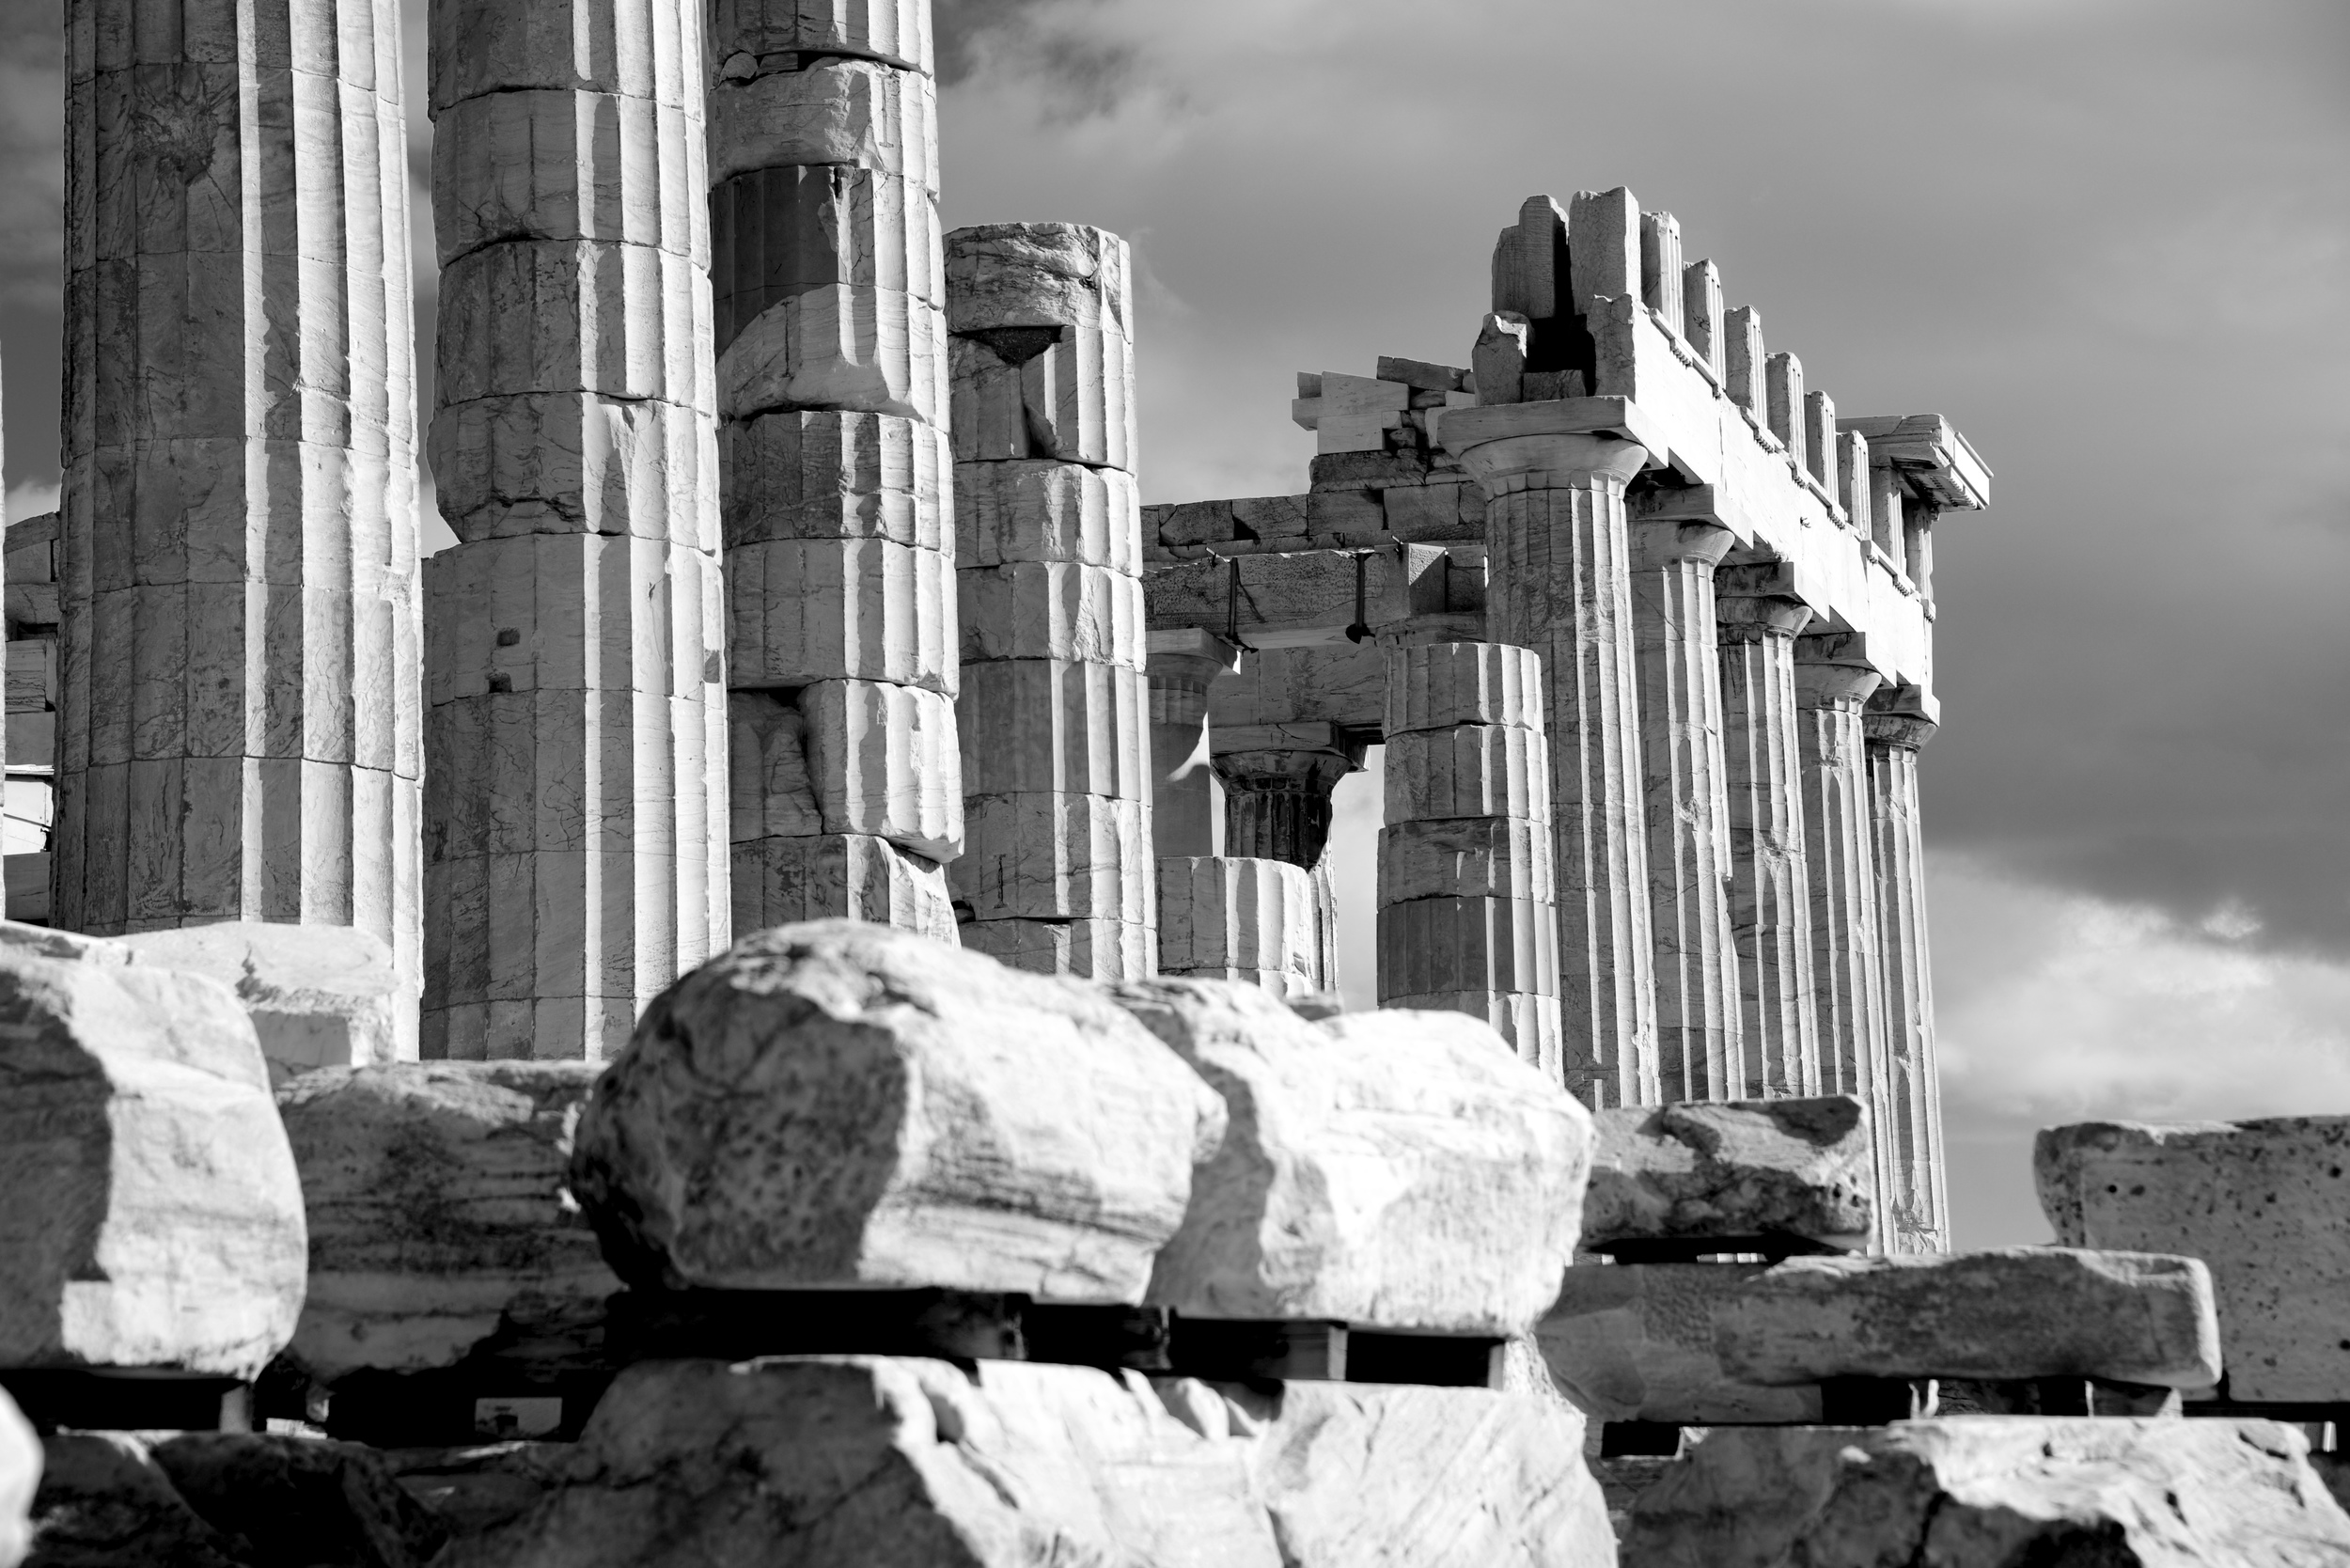 Mono piles of stones before ruined Parthenon.jpg